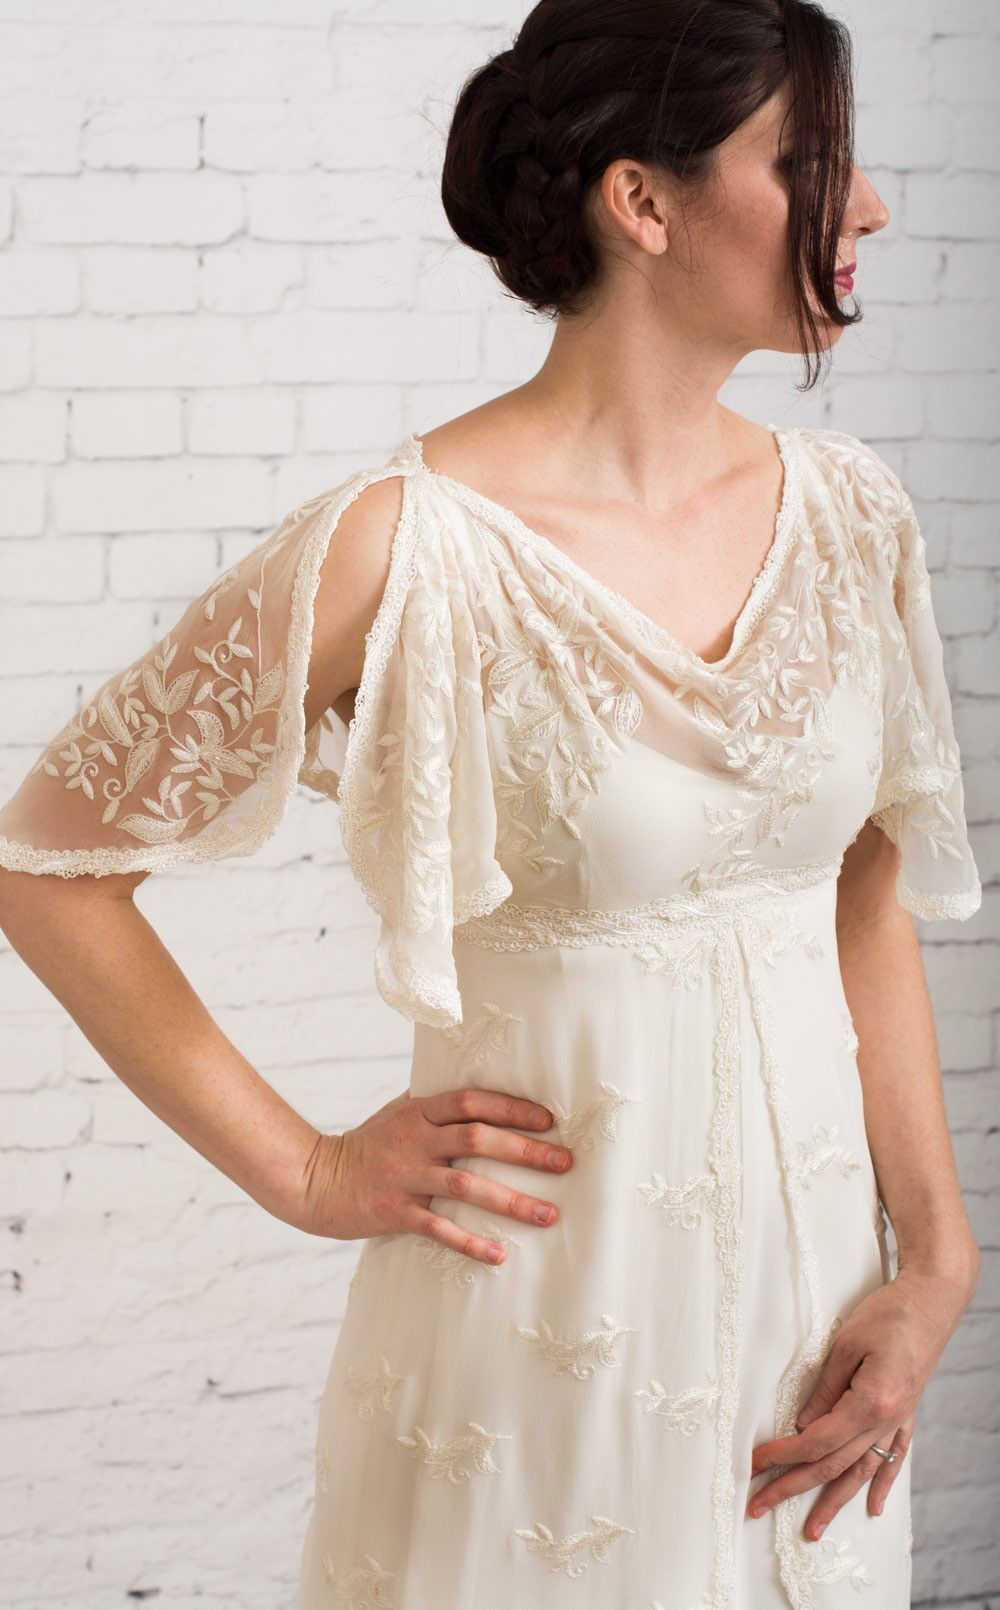 Athena Simple Wedding Dress Casual Casual Wedding Dress Vintage Dresses [ 1610 x 1000 Pixel ]